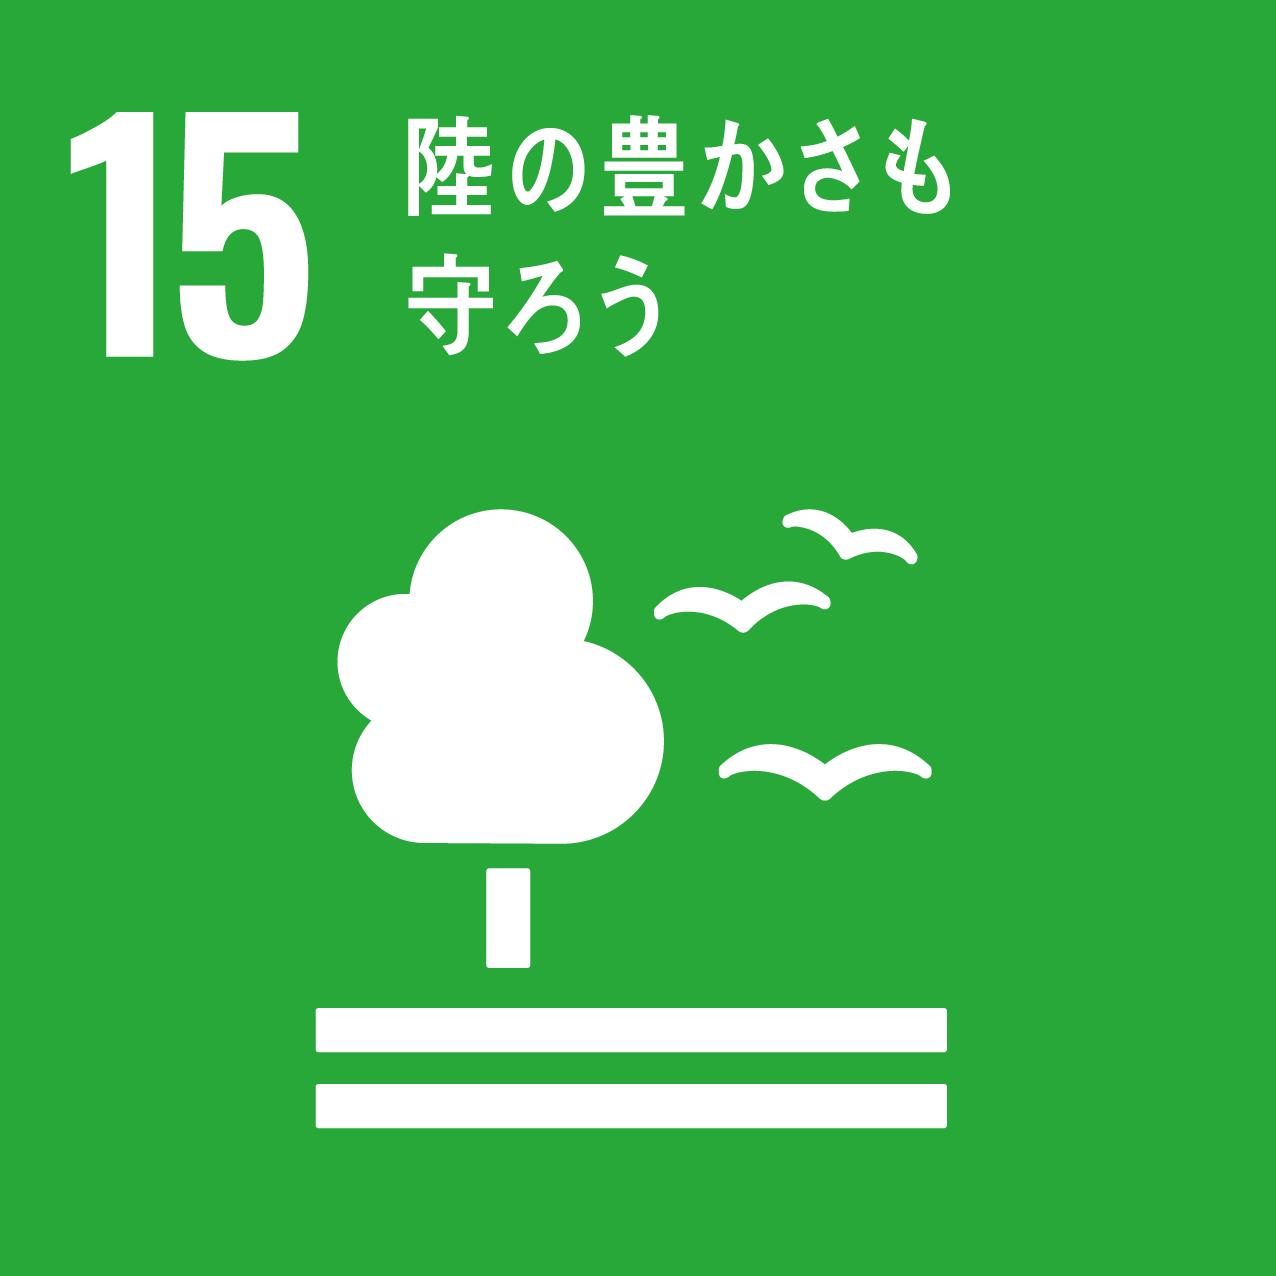 SDGs ゴール15「陸の豊かさも守ろう」